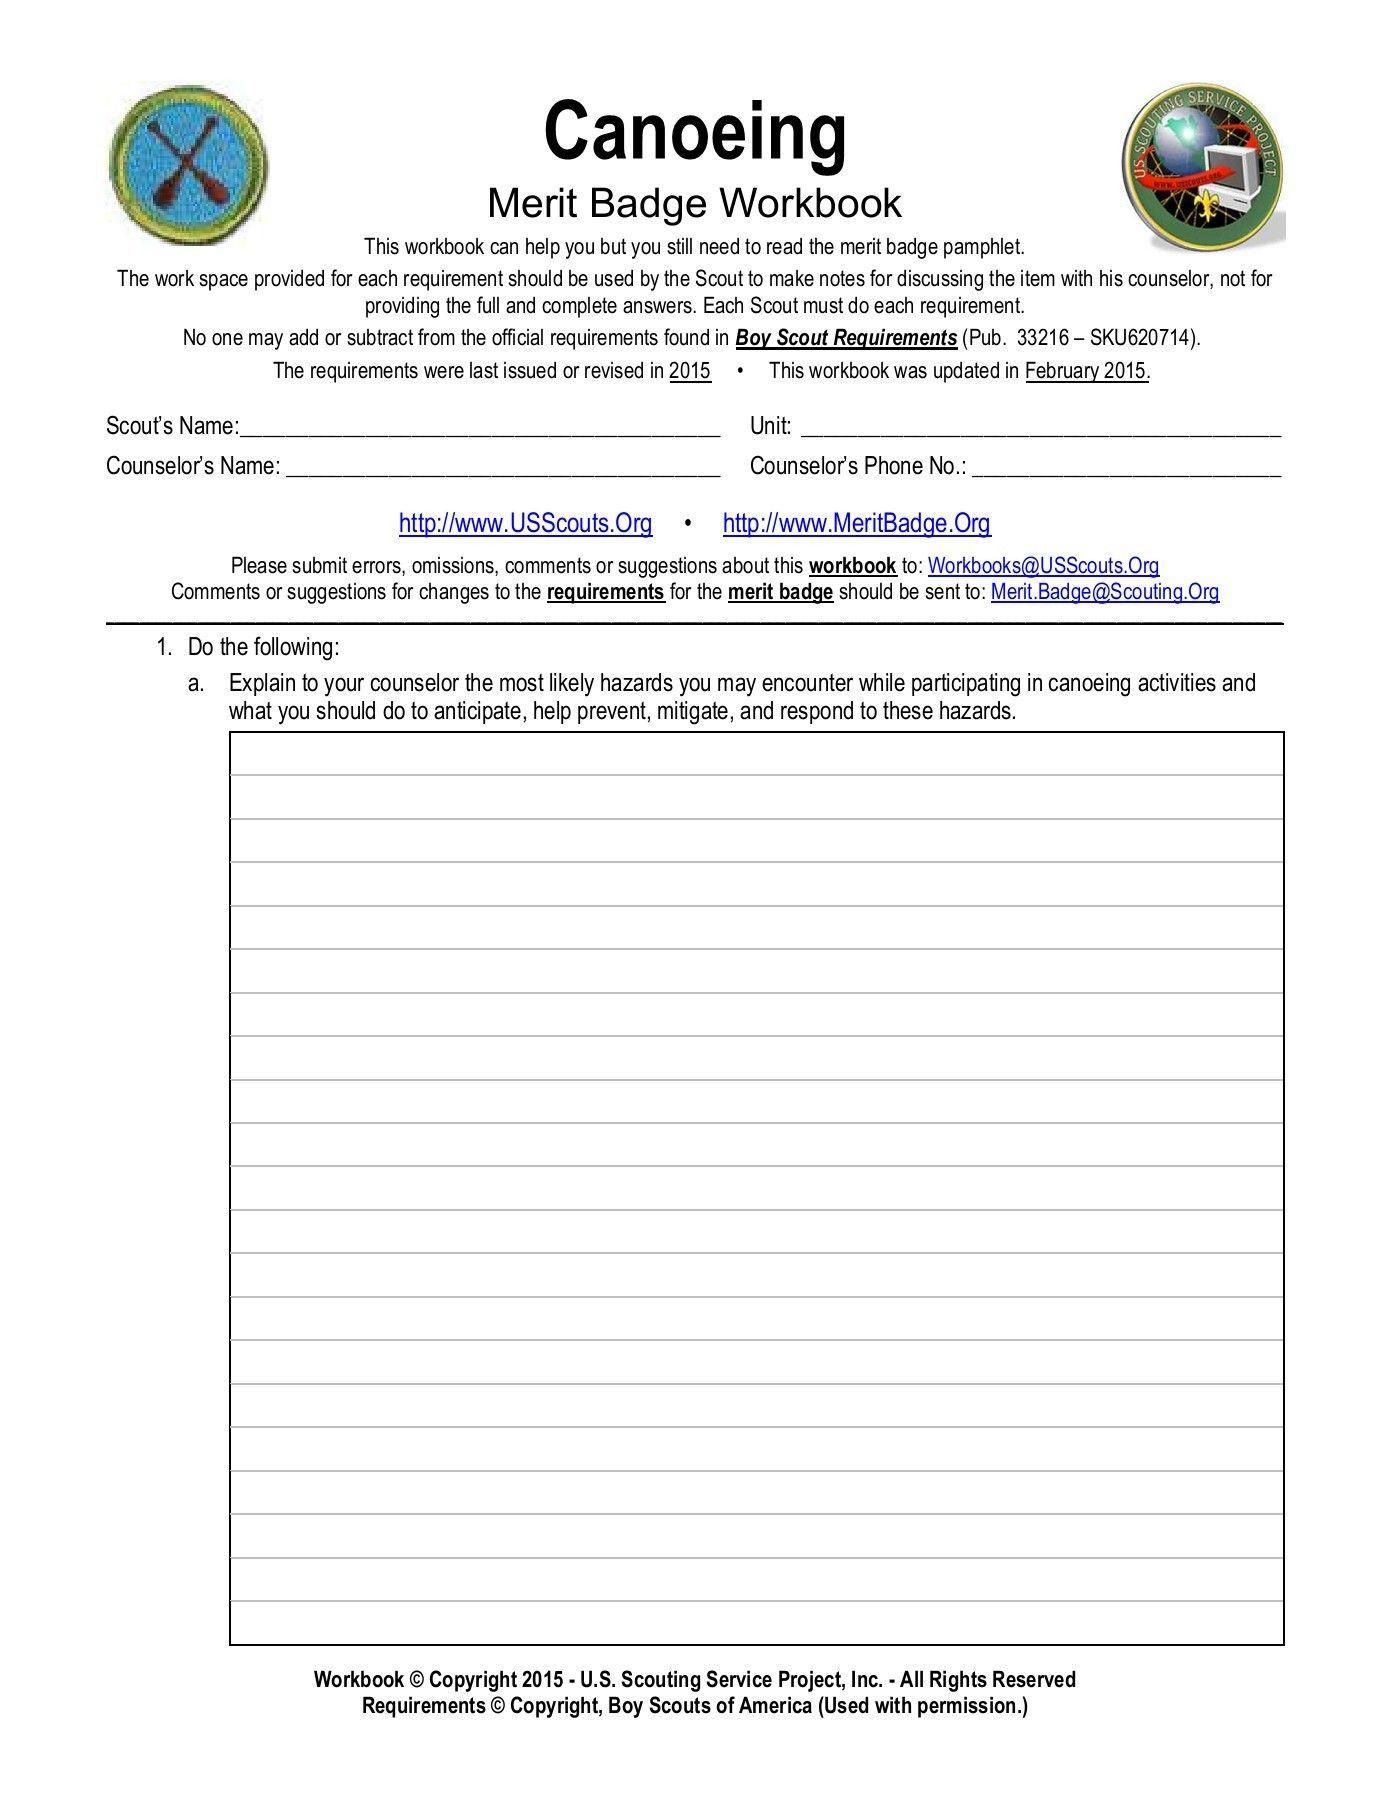 38 Awesome Merit Badge Worksheets Design Ideas